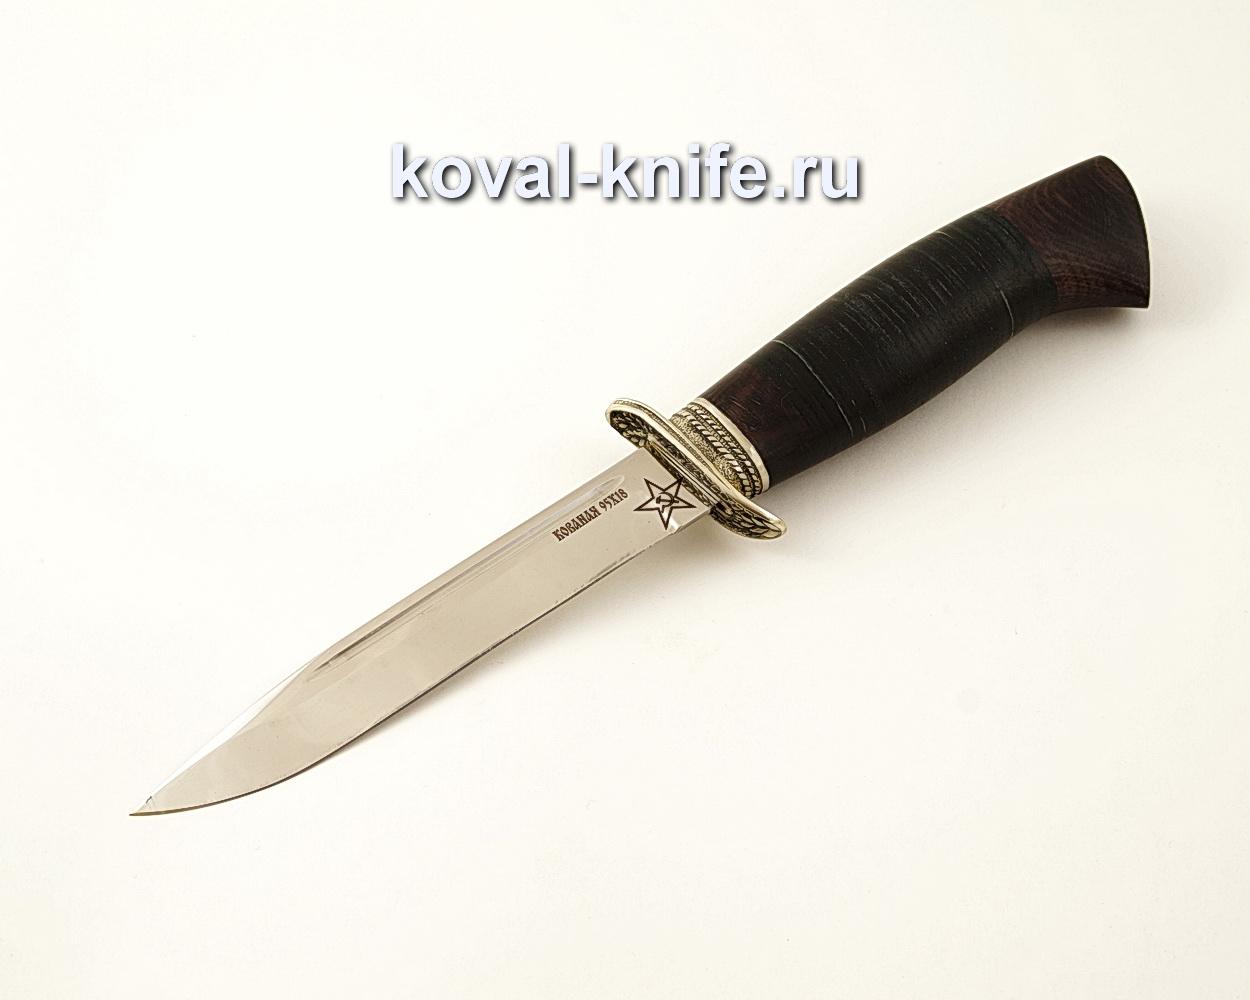 Нож Штрафбат — реплика ножа НР40 из кованой стали 95х18 с рукоятью из кожи и граба A589